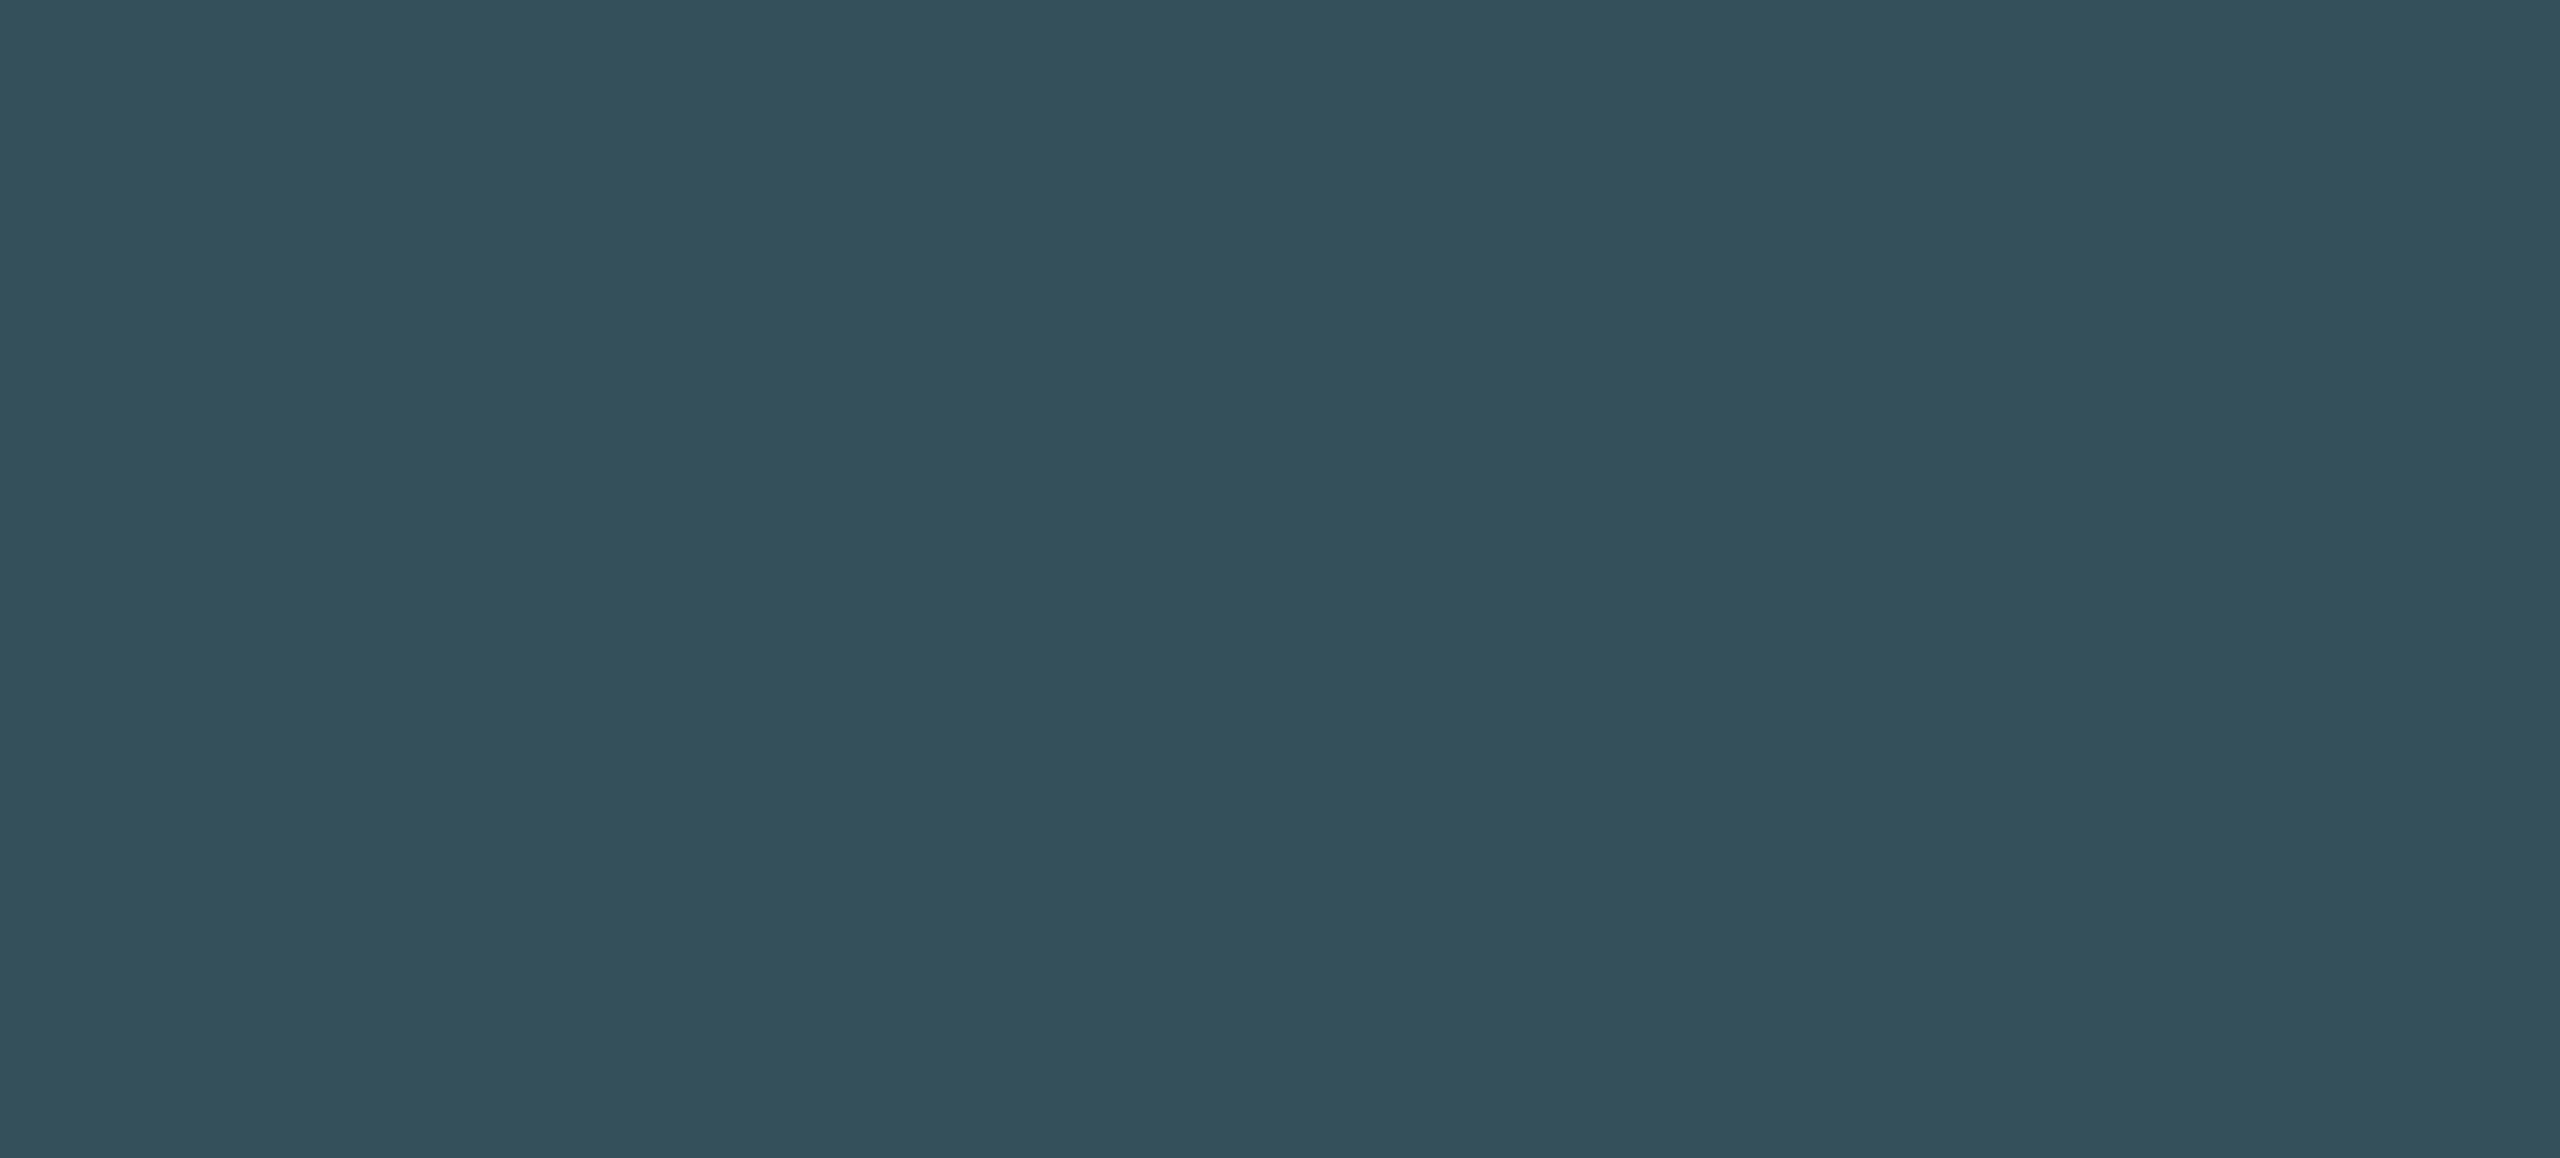 projecthero-logo-blue